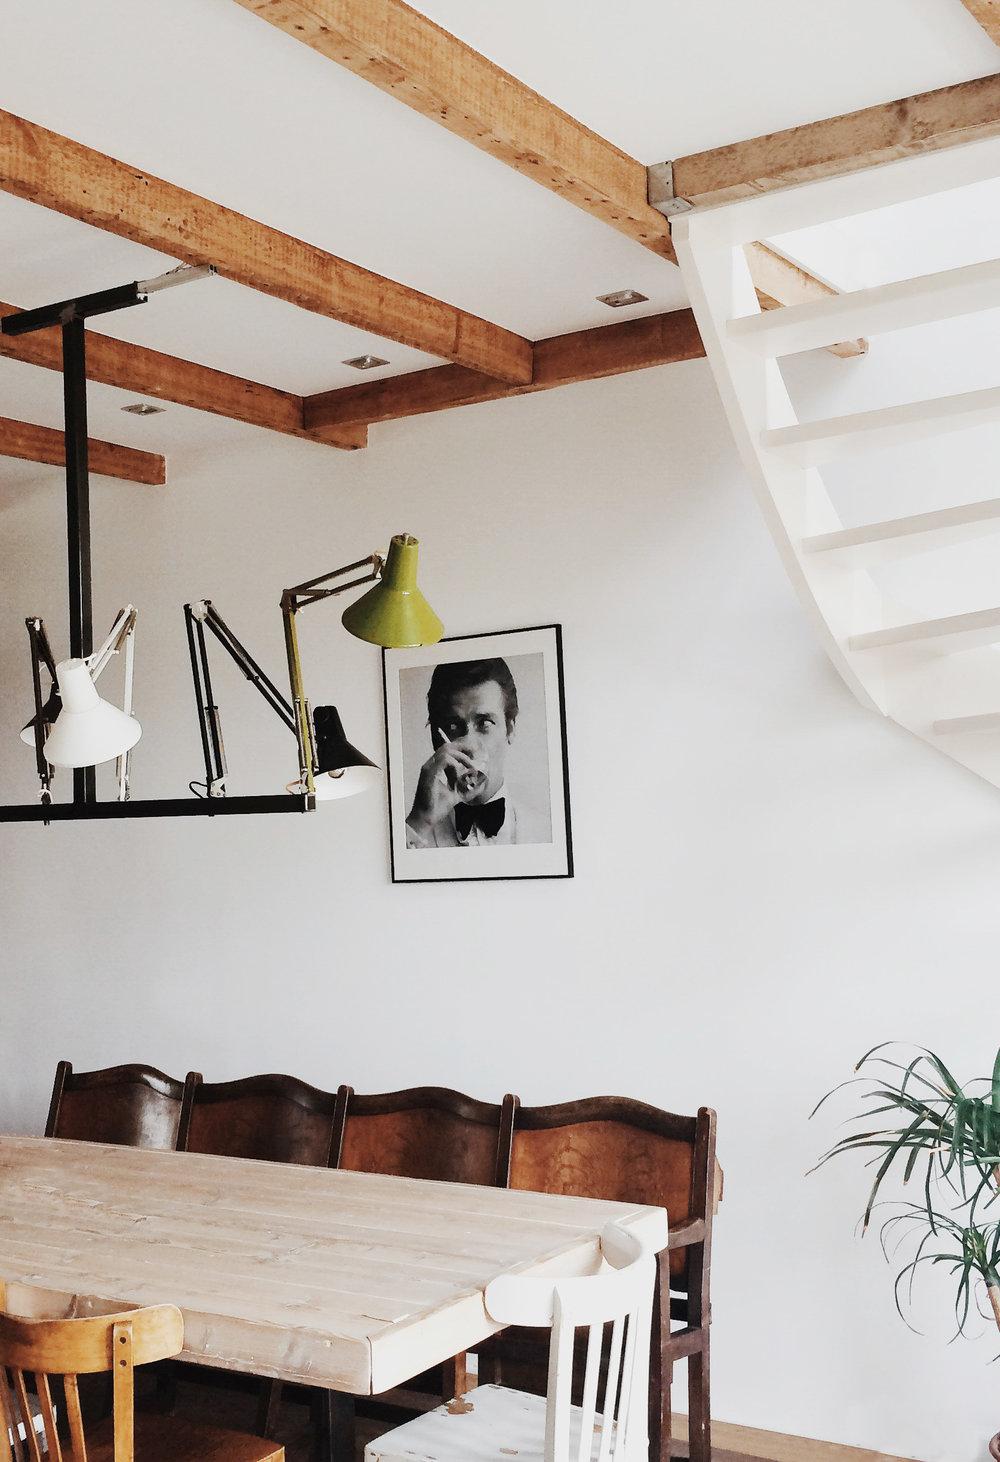 Dutch house design Amsterdam Toronto Interior Travel Photographers - Suech and Beck